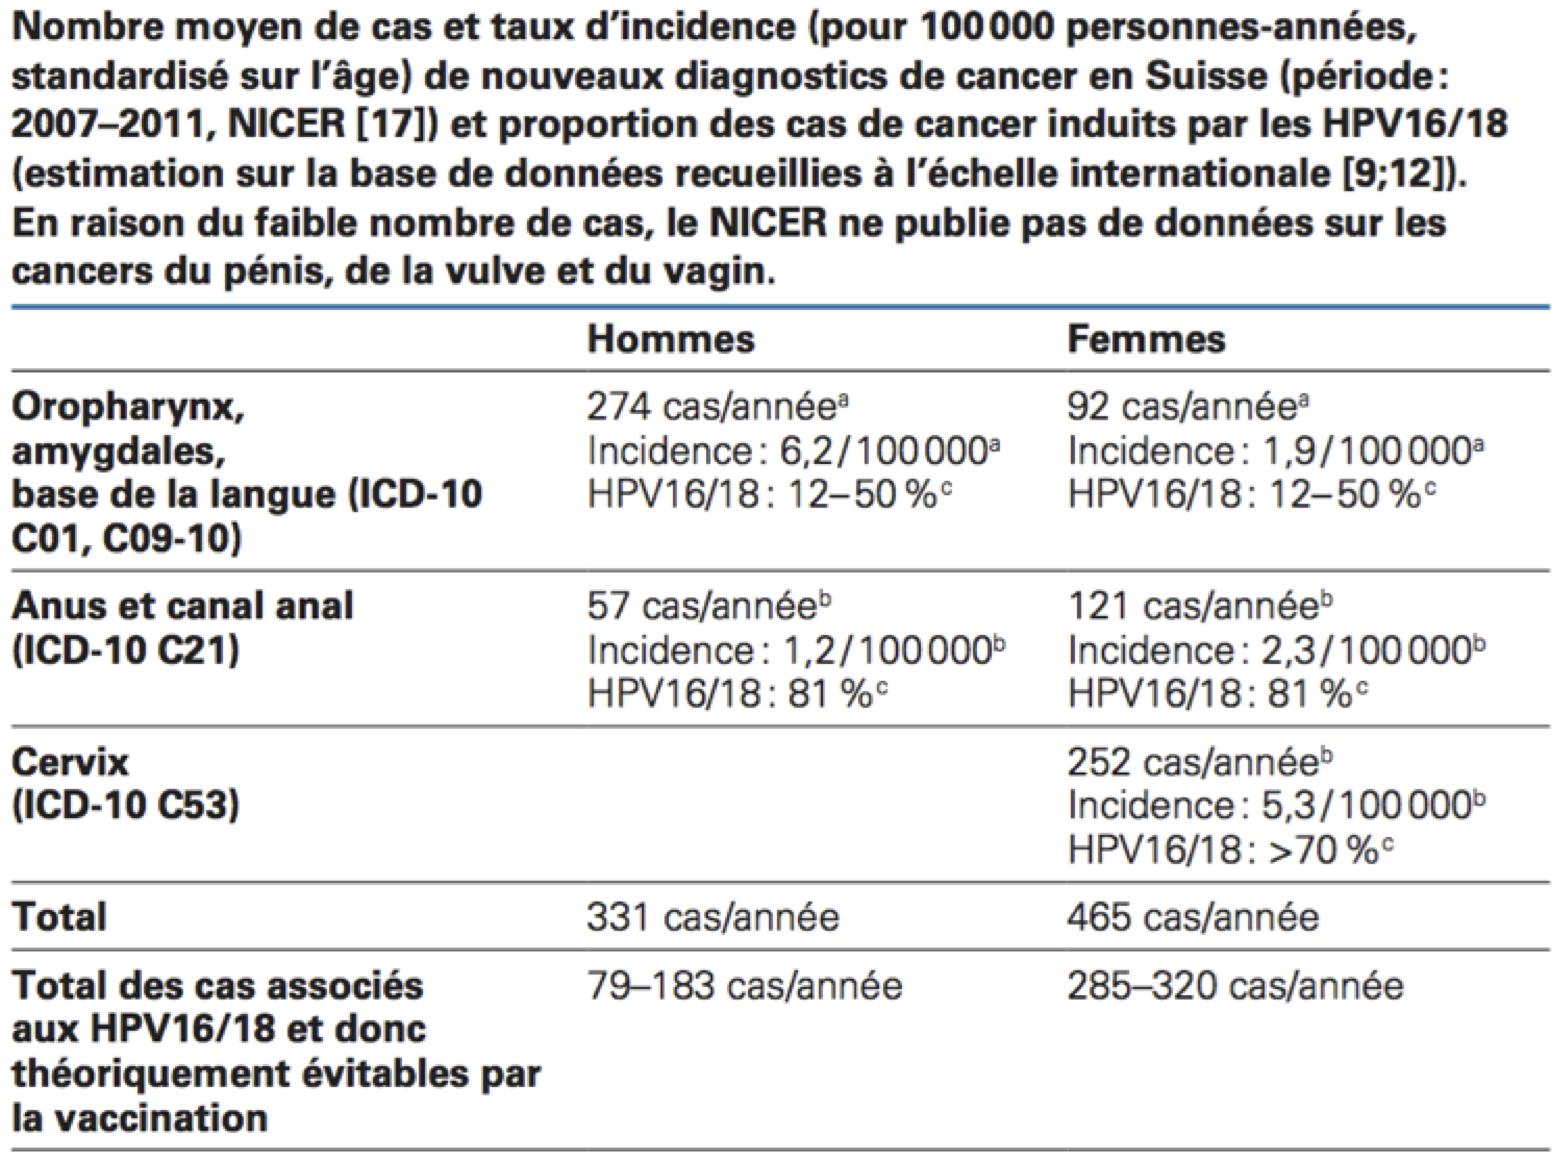 Cancer tumor benign malignant, Hpv alto rischio numeri